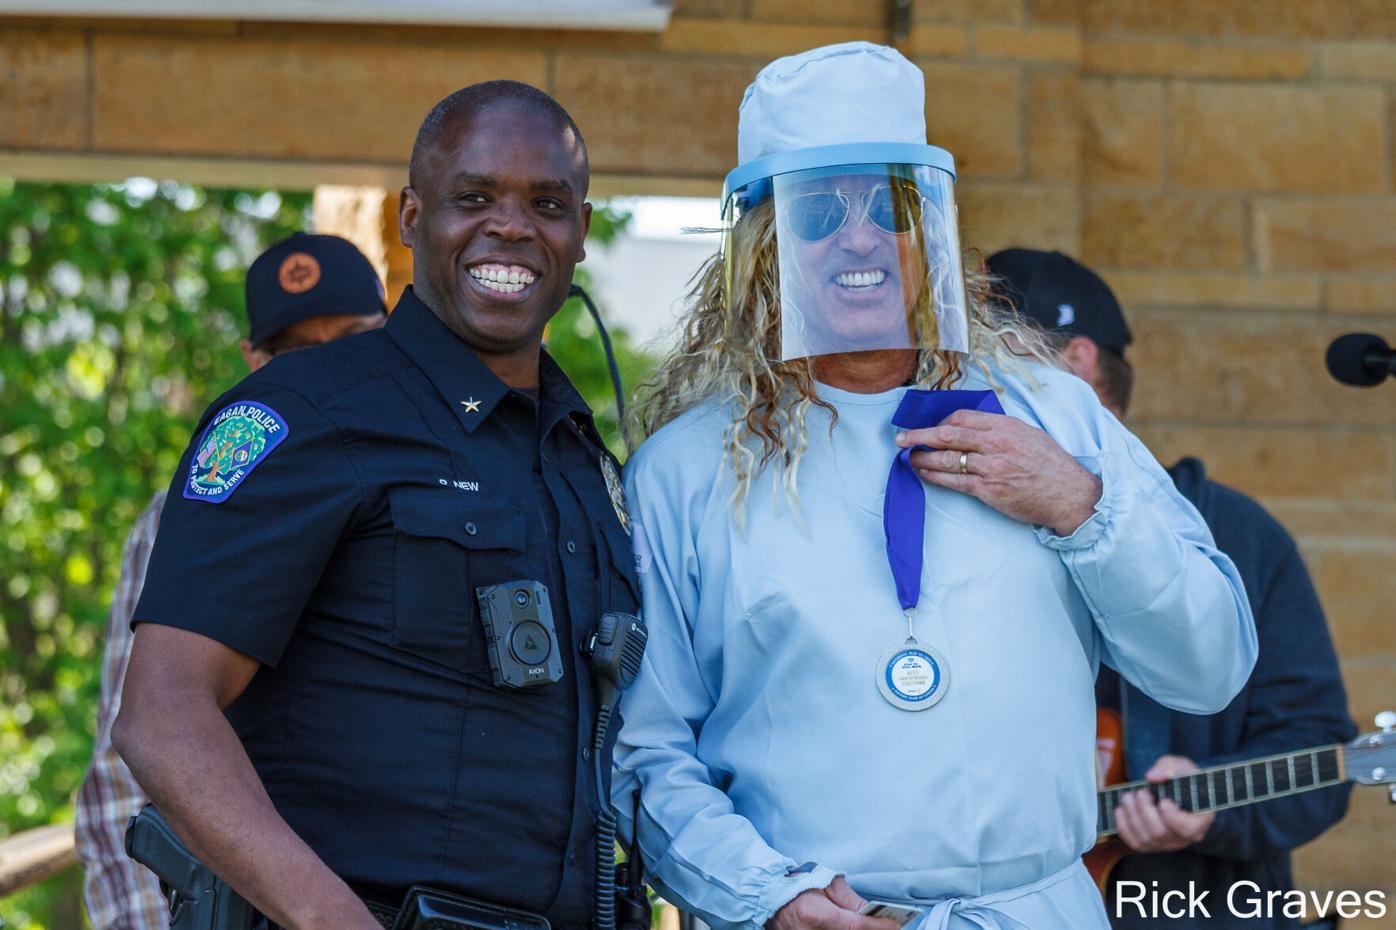 RickGraves Rotary LivetoGiveWalk Best CostumeDr.GlenPerkins.jpg